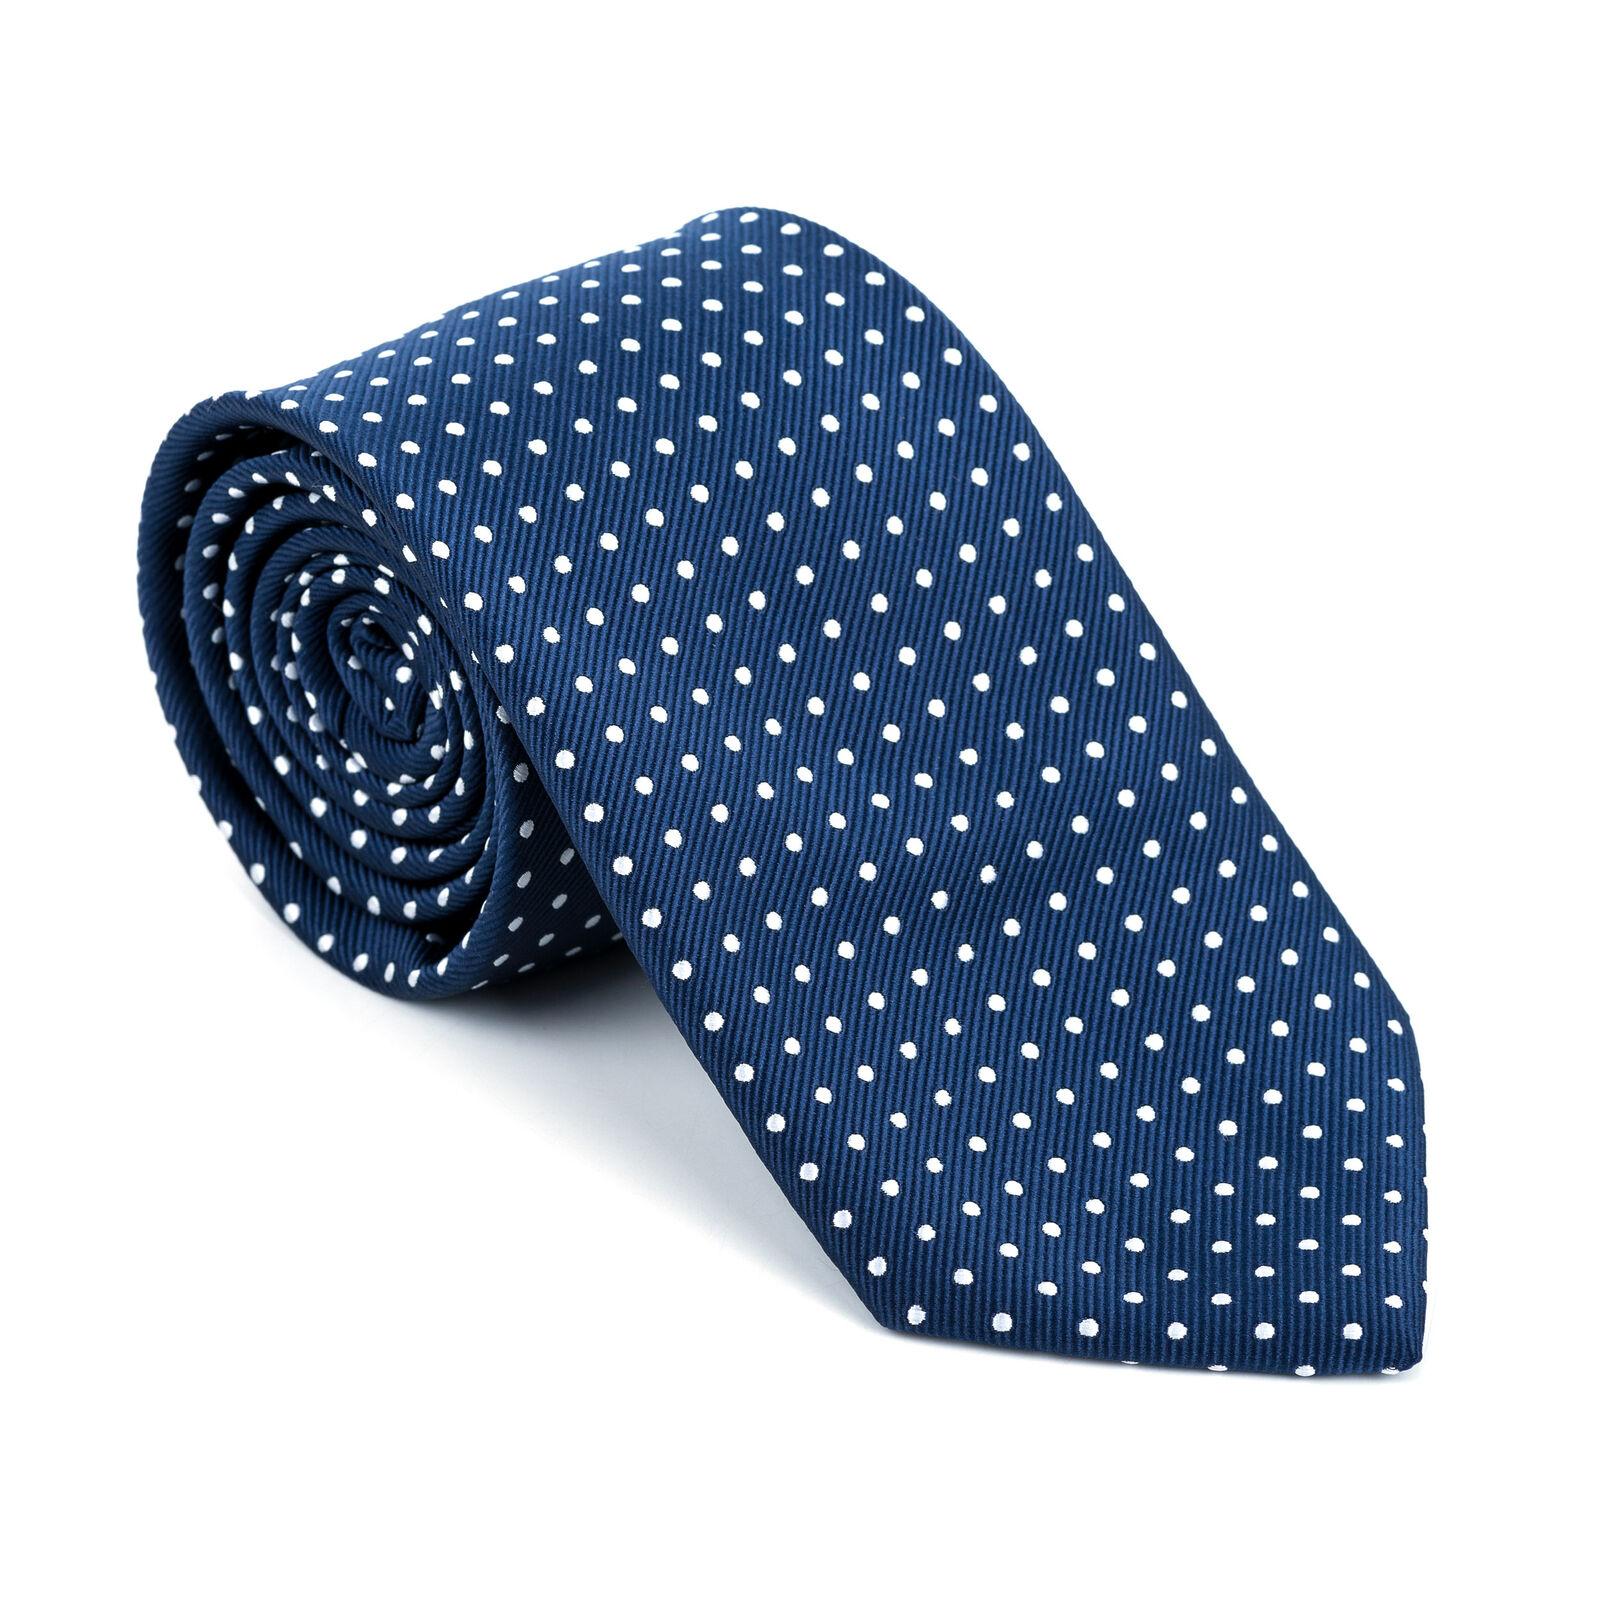 UK Navy Tie Polka Dot Regular Formal Wedding Necktie Multiple Colours